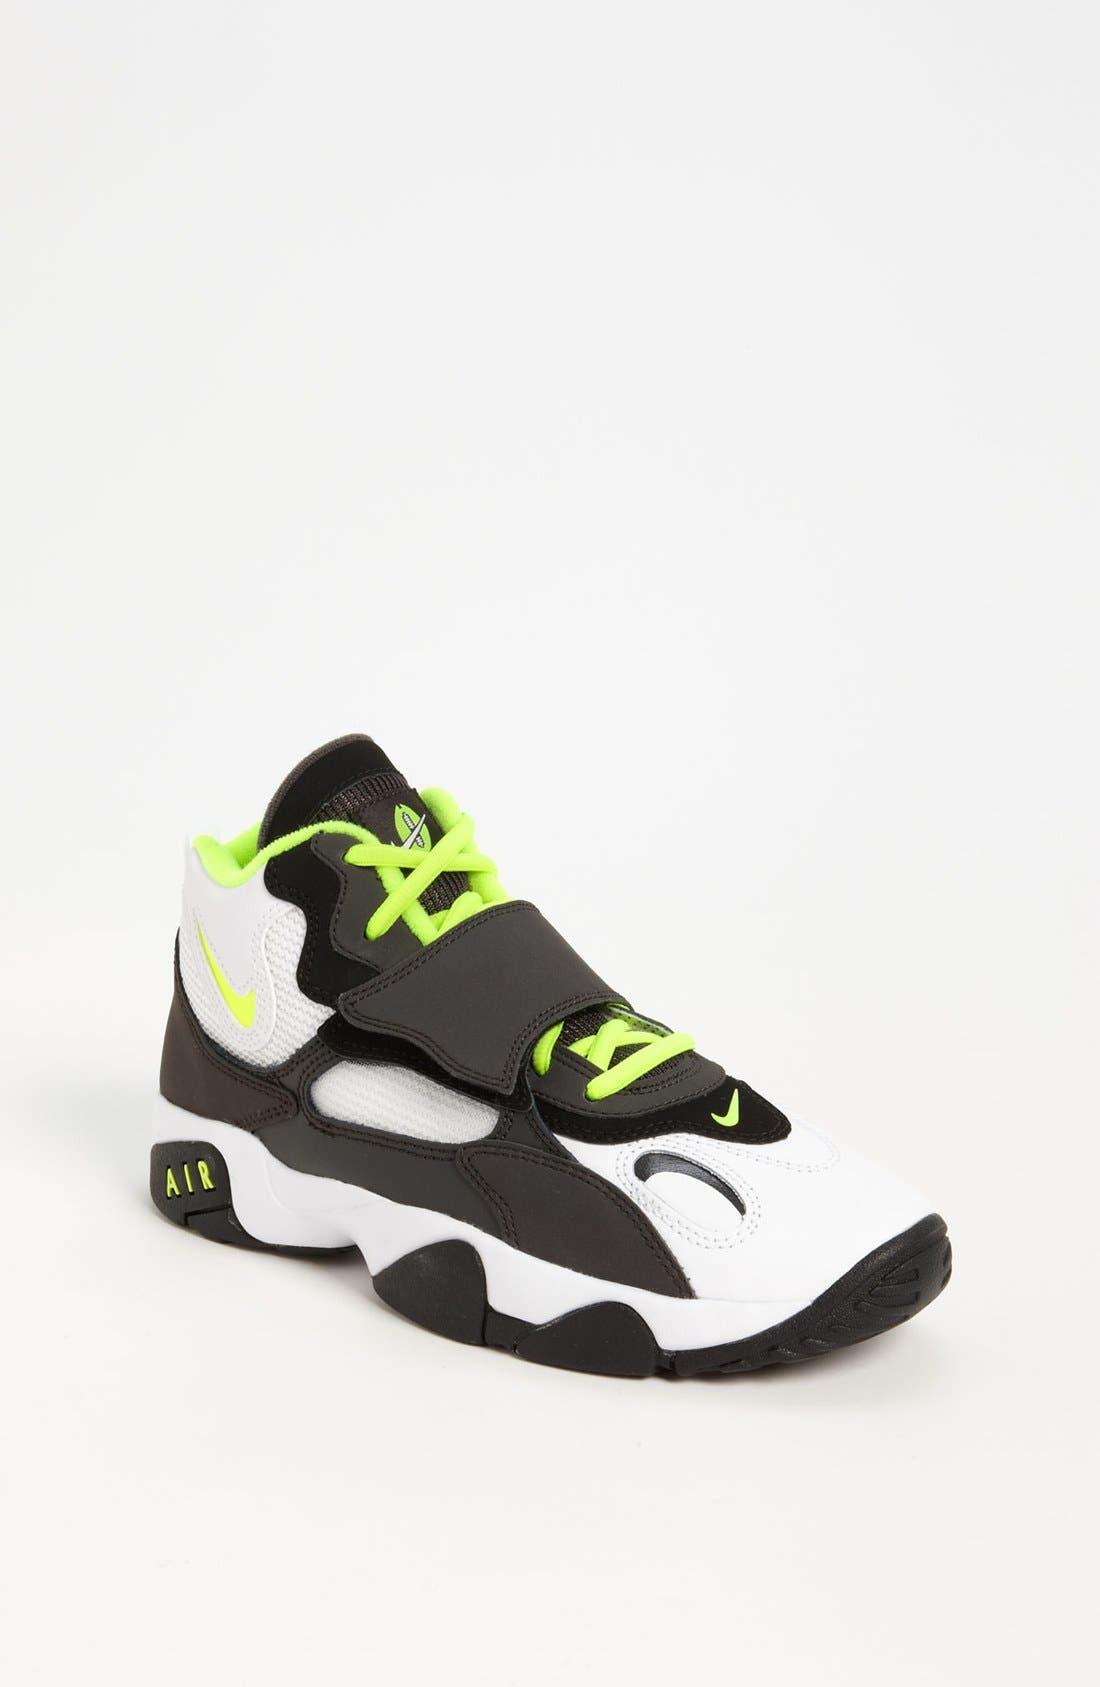 Main Image - Nike 'Air® Speed Turf' Athletic Shoe (Big Kid)